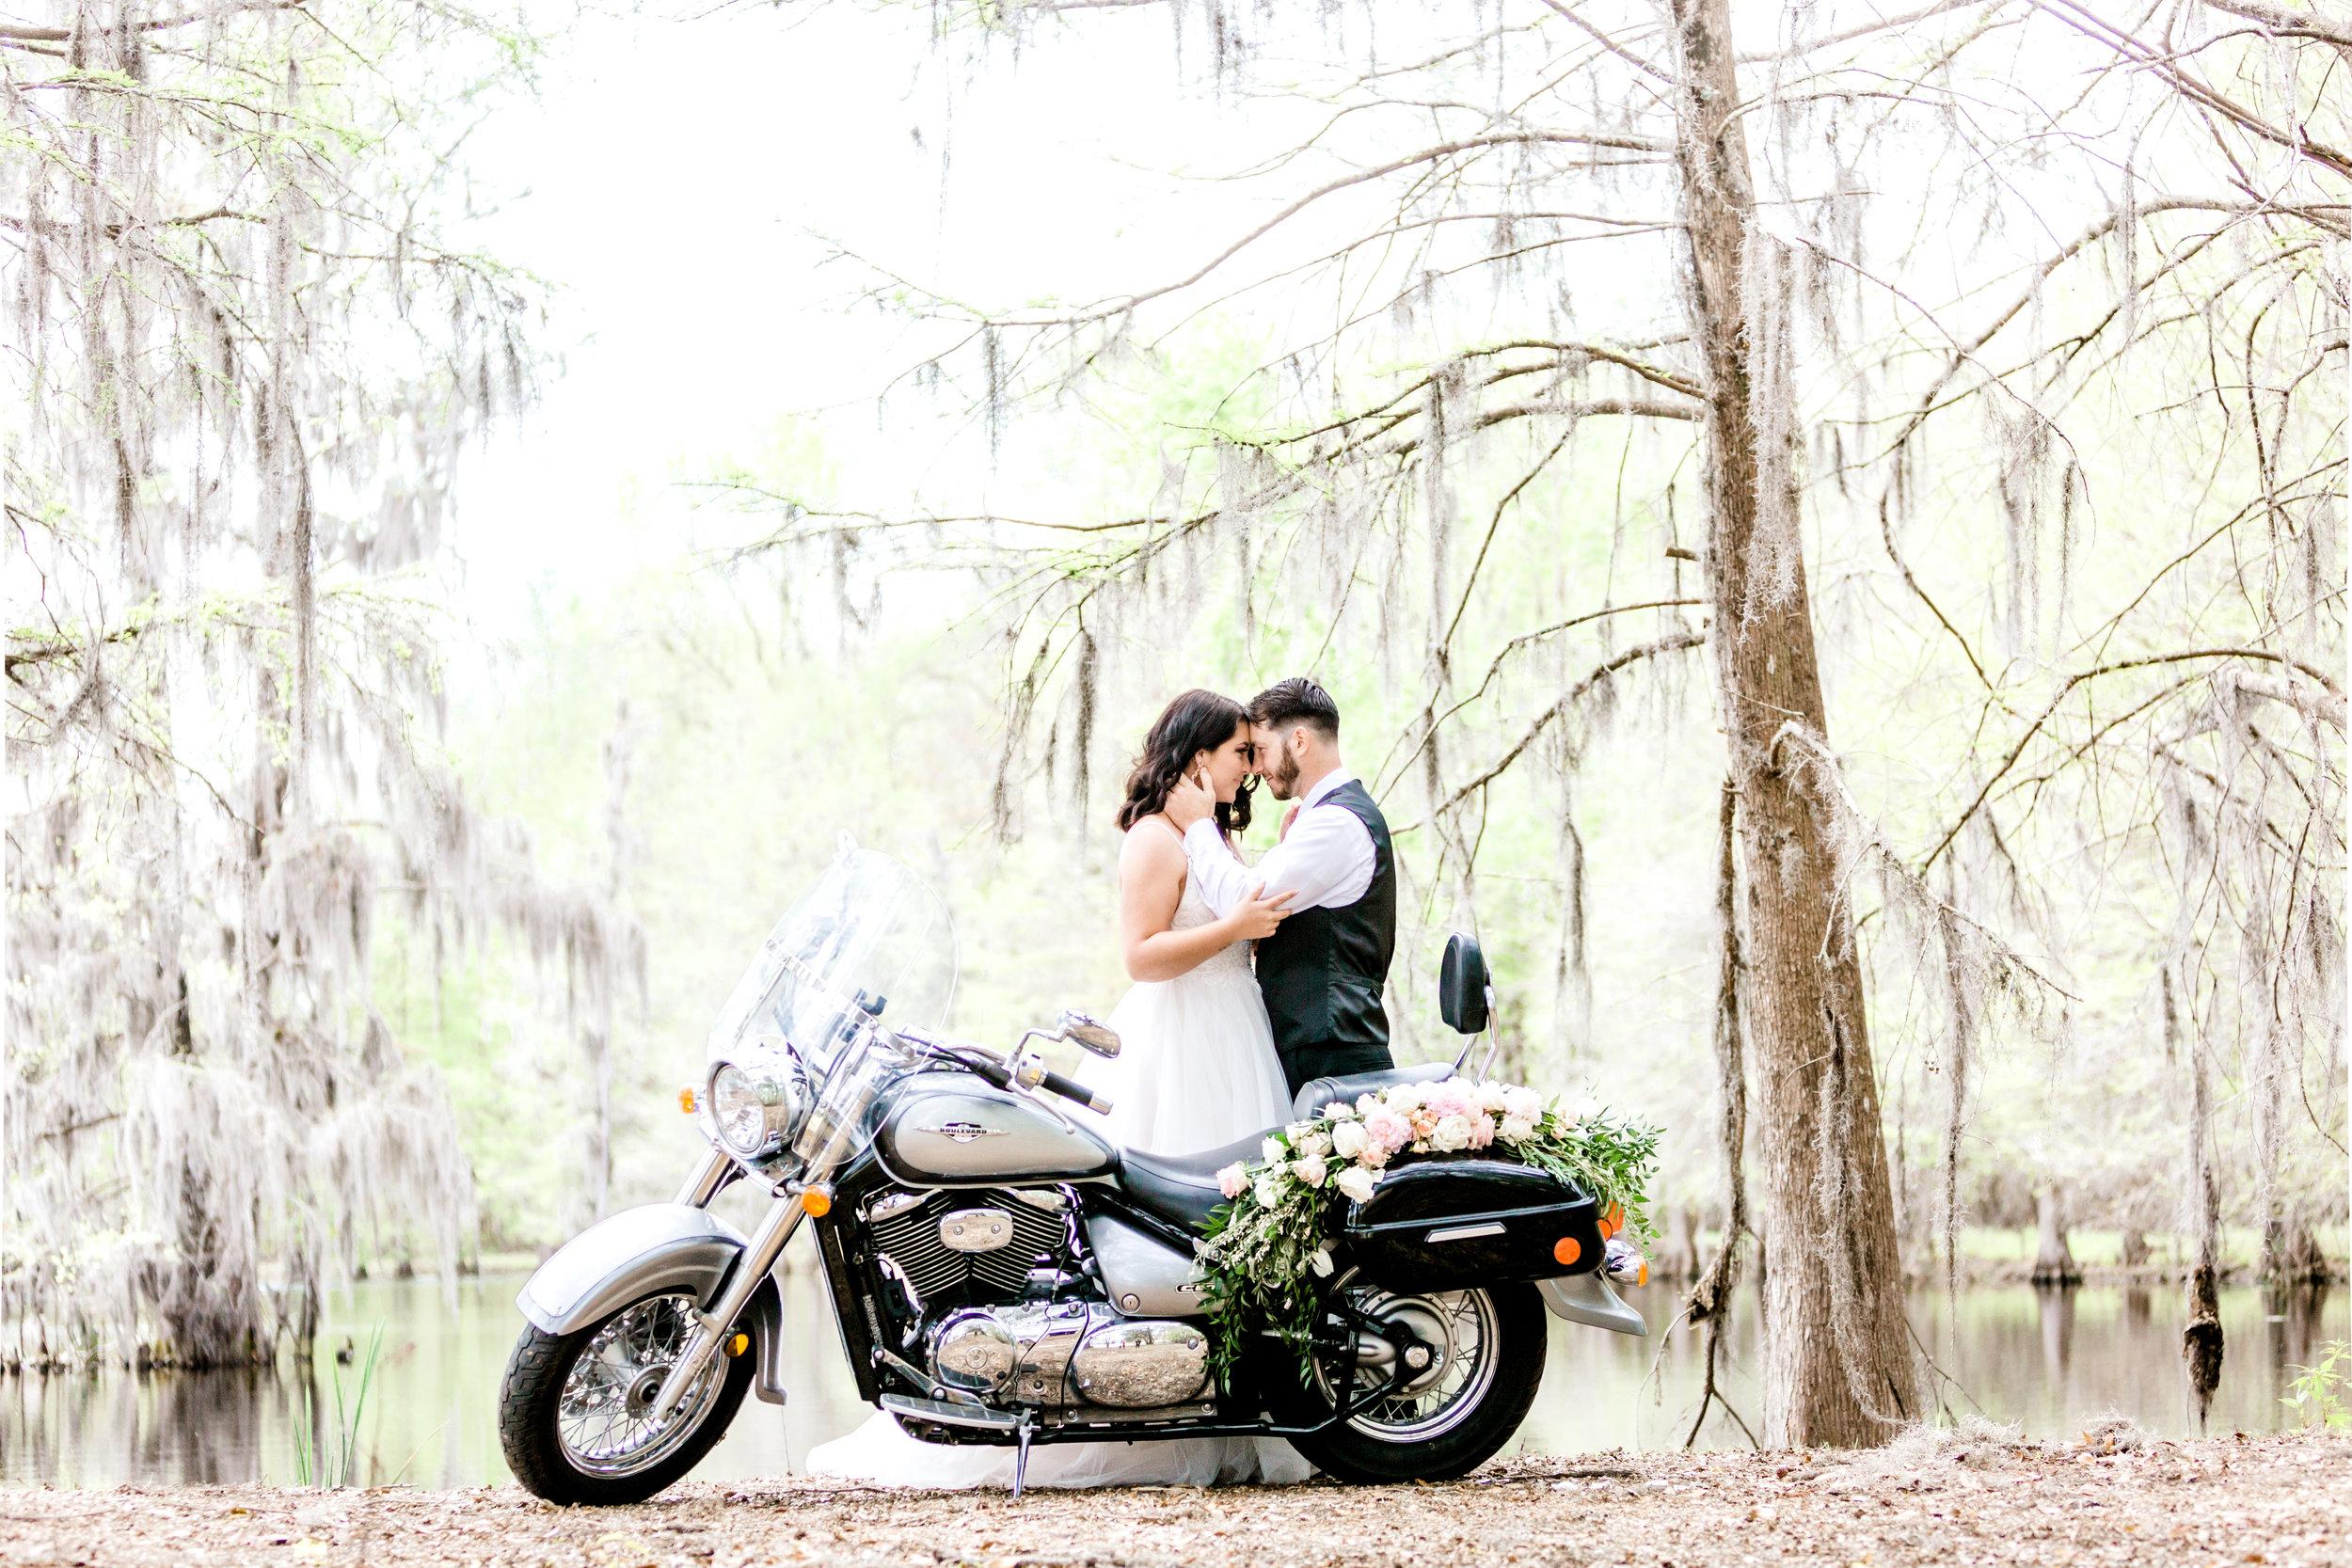 Outdoor wedding motorcycle.jpg